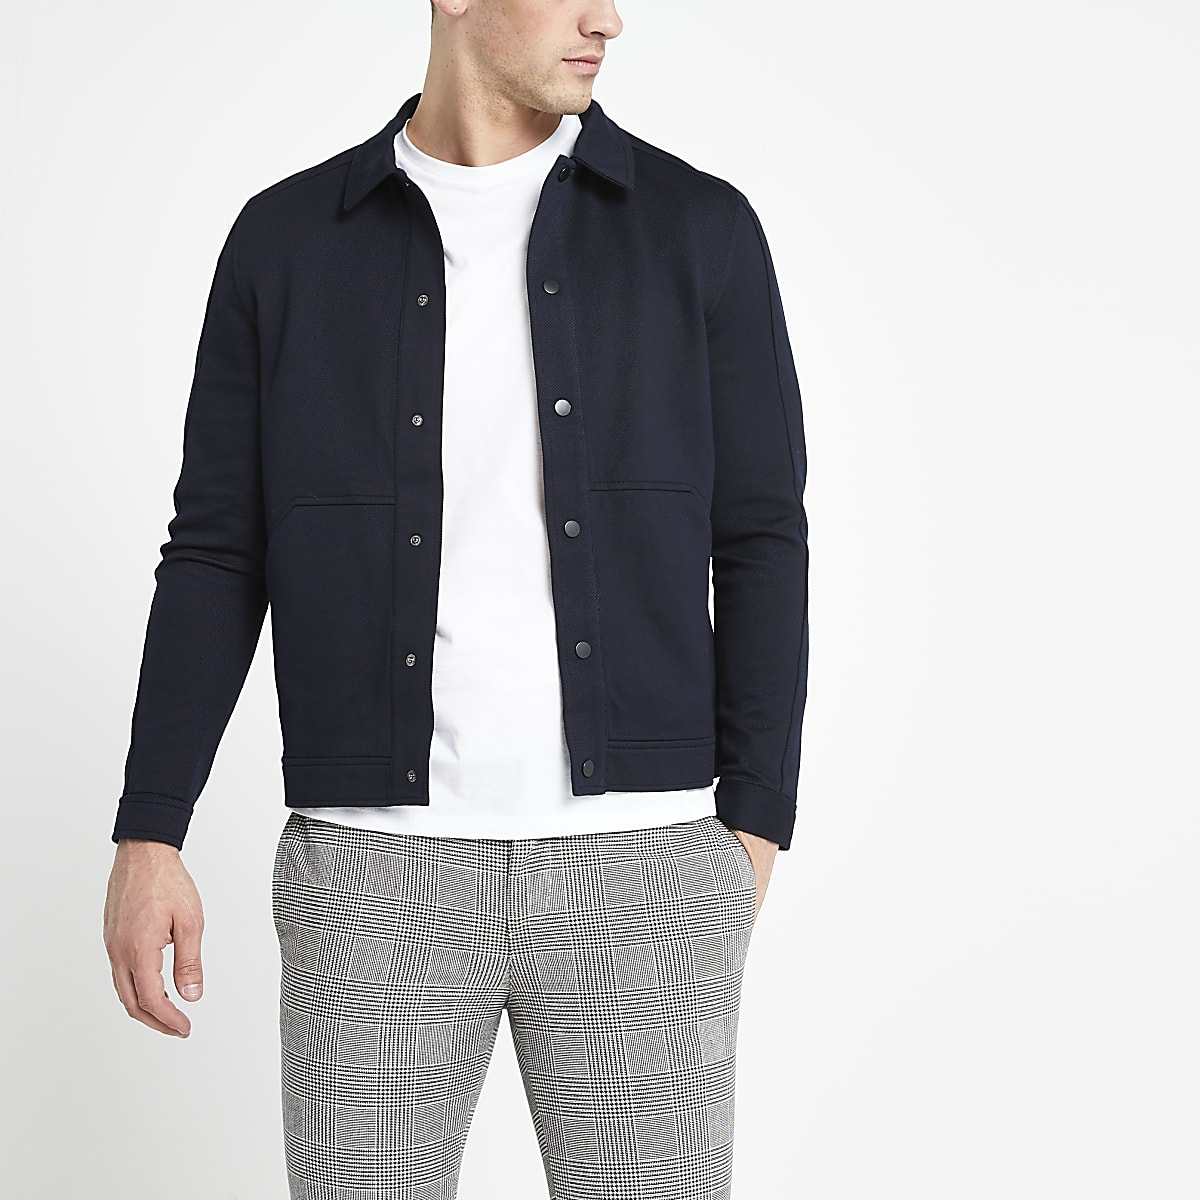 Selected Homme navy sweatshirt jacket